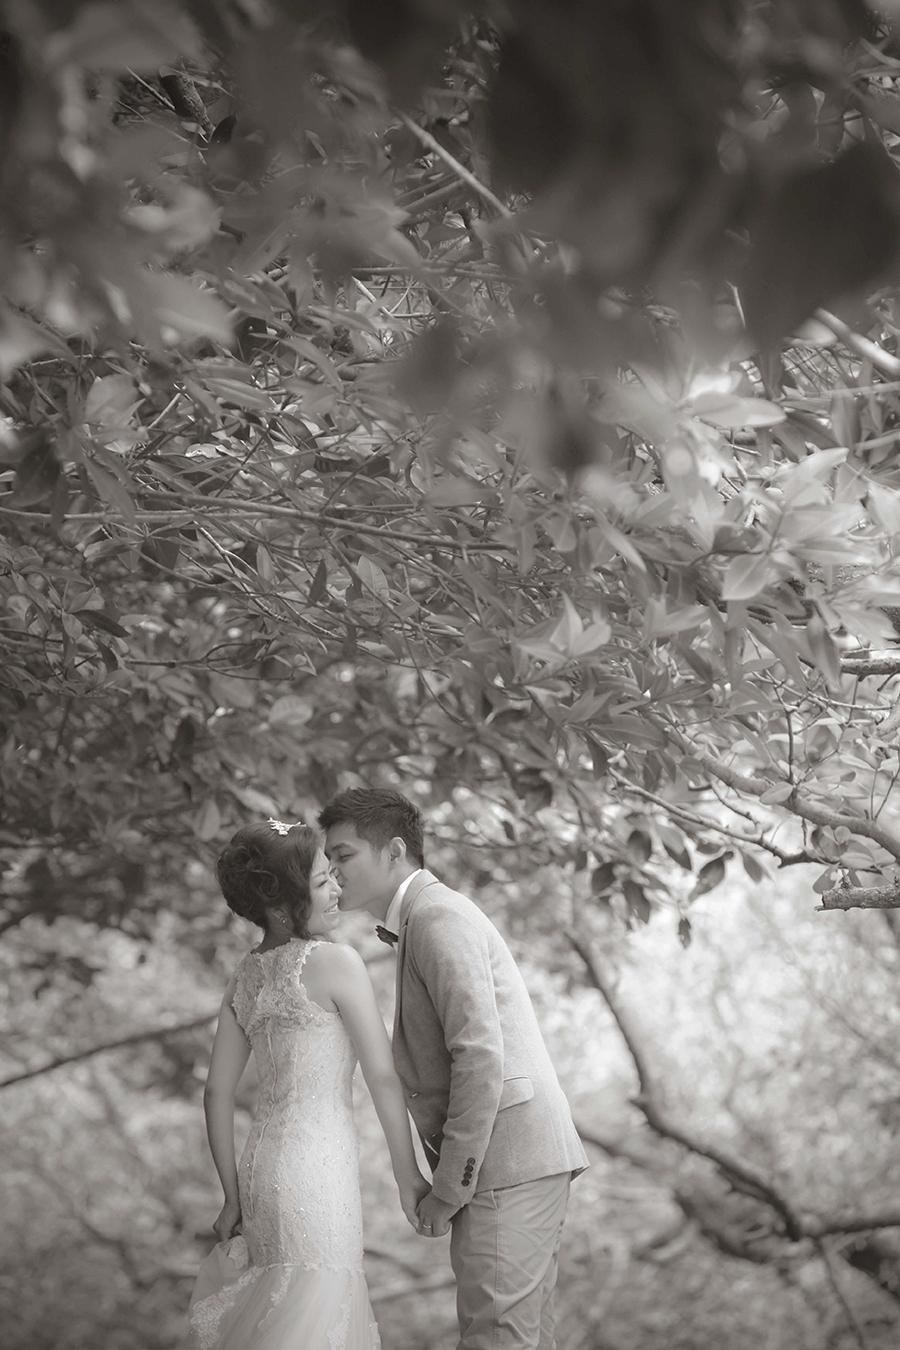 bali pre-wedding photography by kurt ahs . 5121.jpg